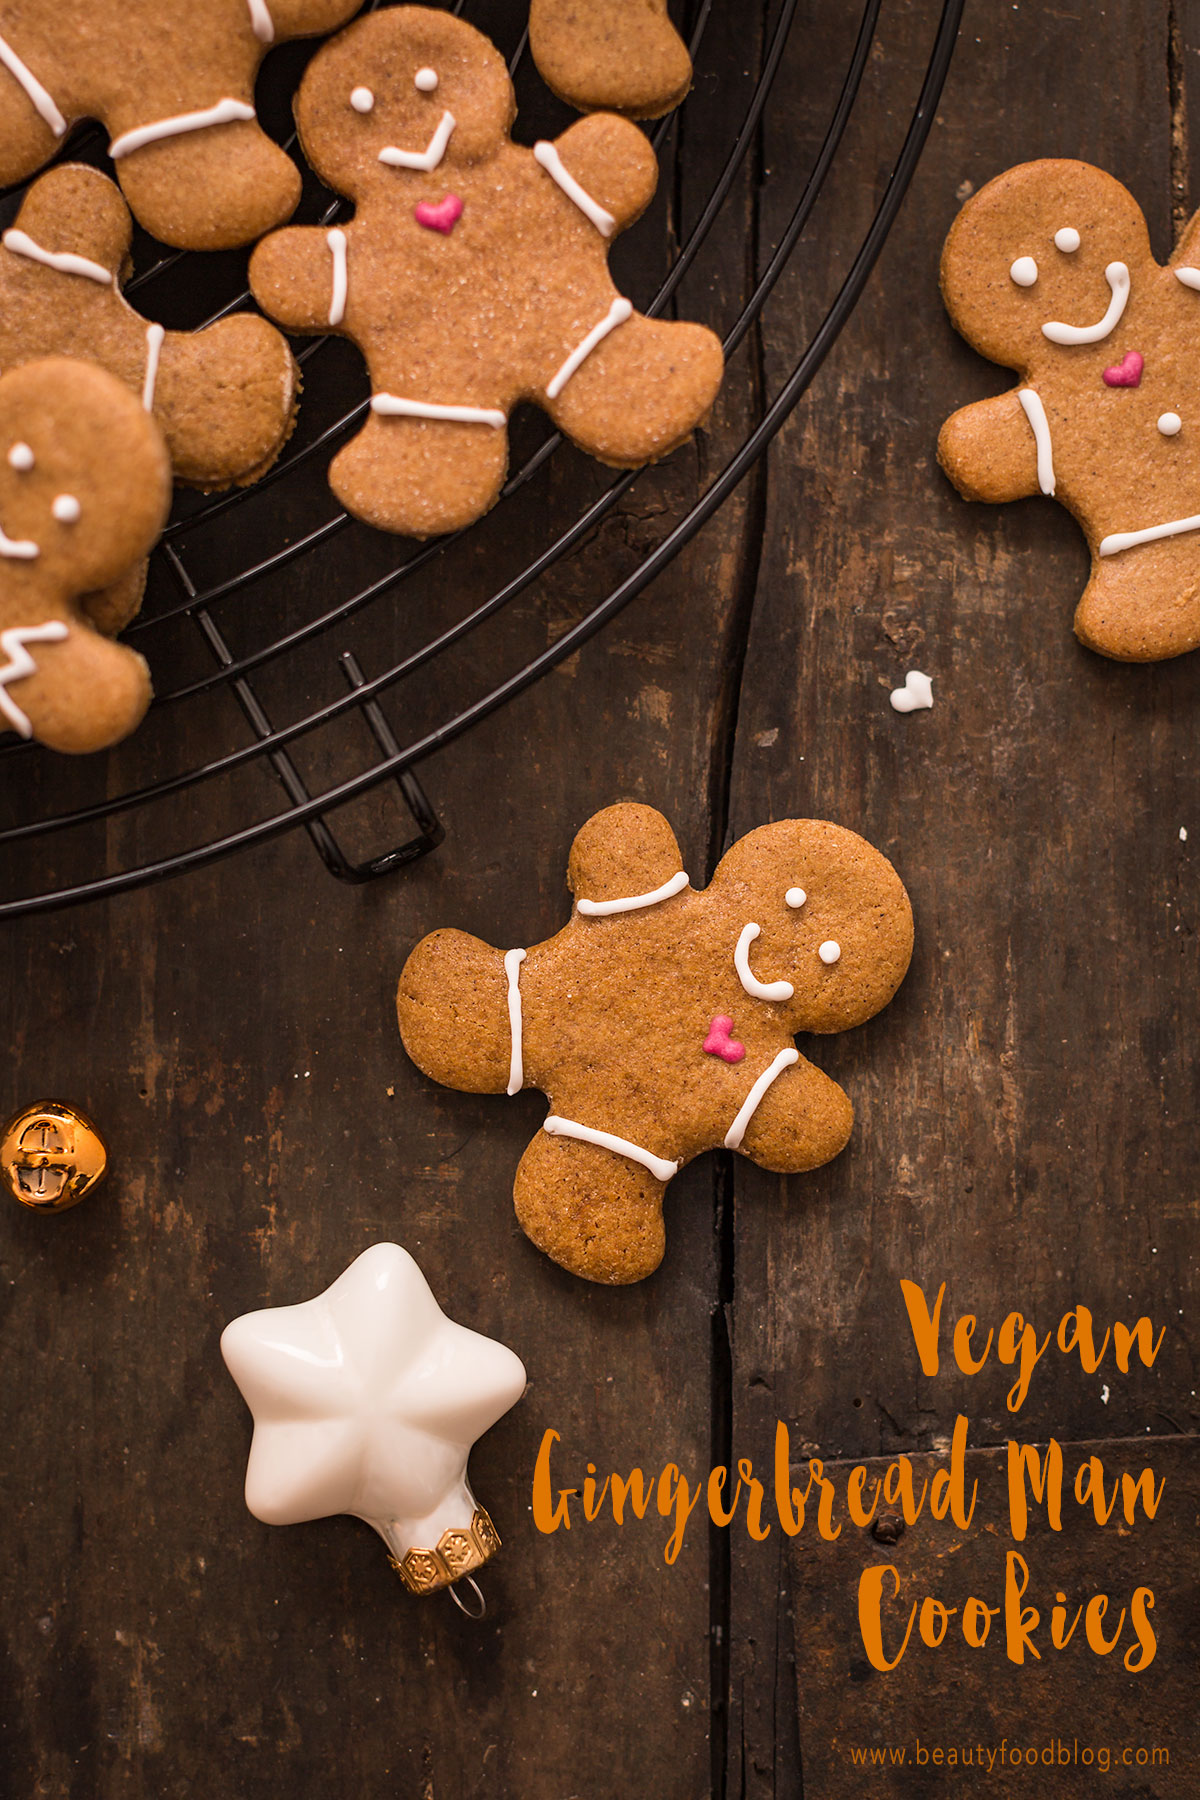 vegan gingerbread man recipe vegani - ricetta biscotti pan di zenzero vegani croccanti leggeri e friabili #vegan gingerbread senza burro